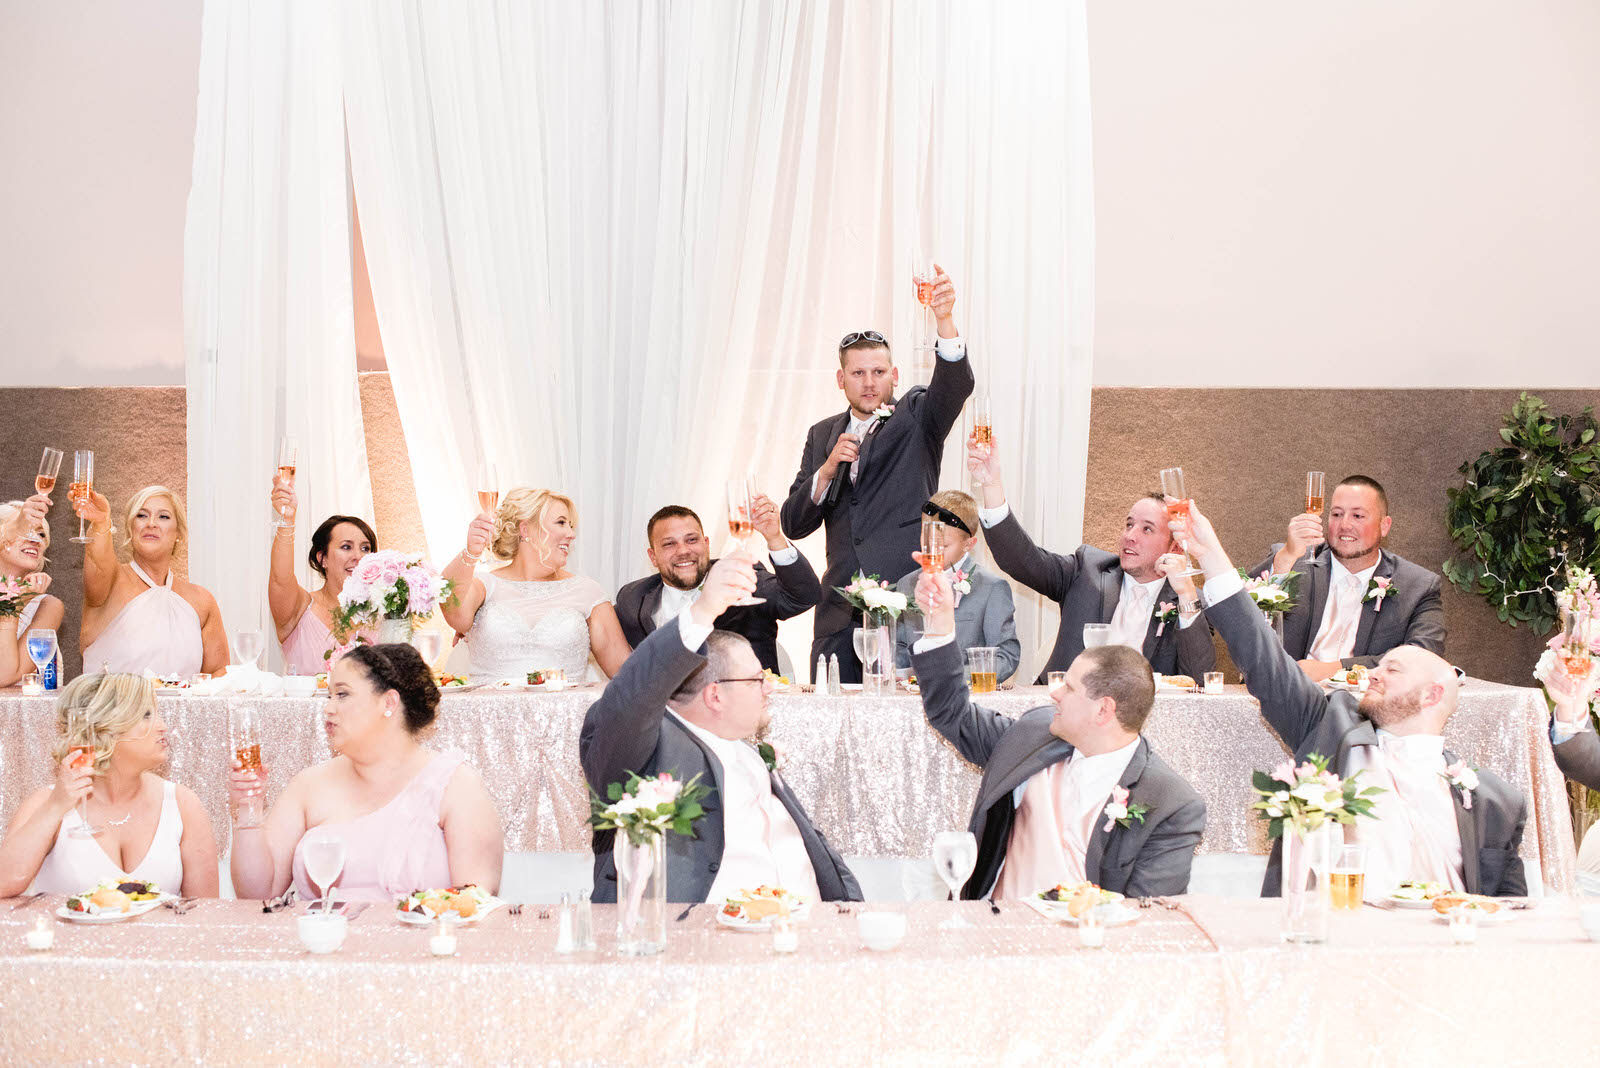 weddings-at-Holy-Cross-Greek-Orthodox-Church-and-Hall-70.jpg